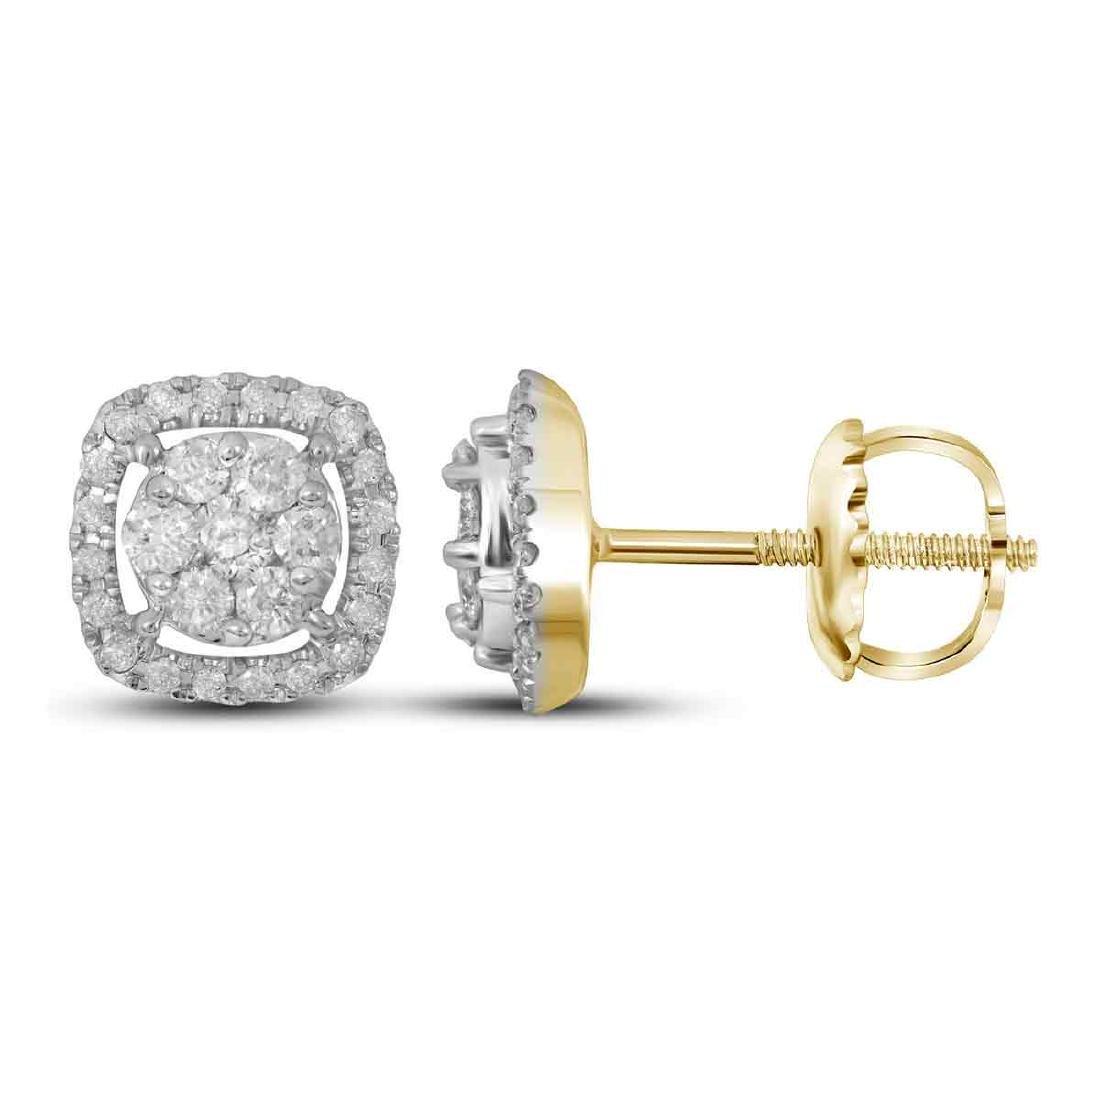 0.38 CTW Diamond Cluster Earrings 14KT Yellow Gold -